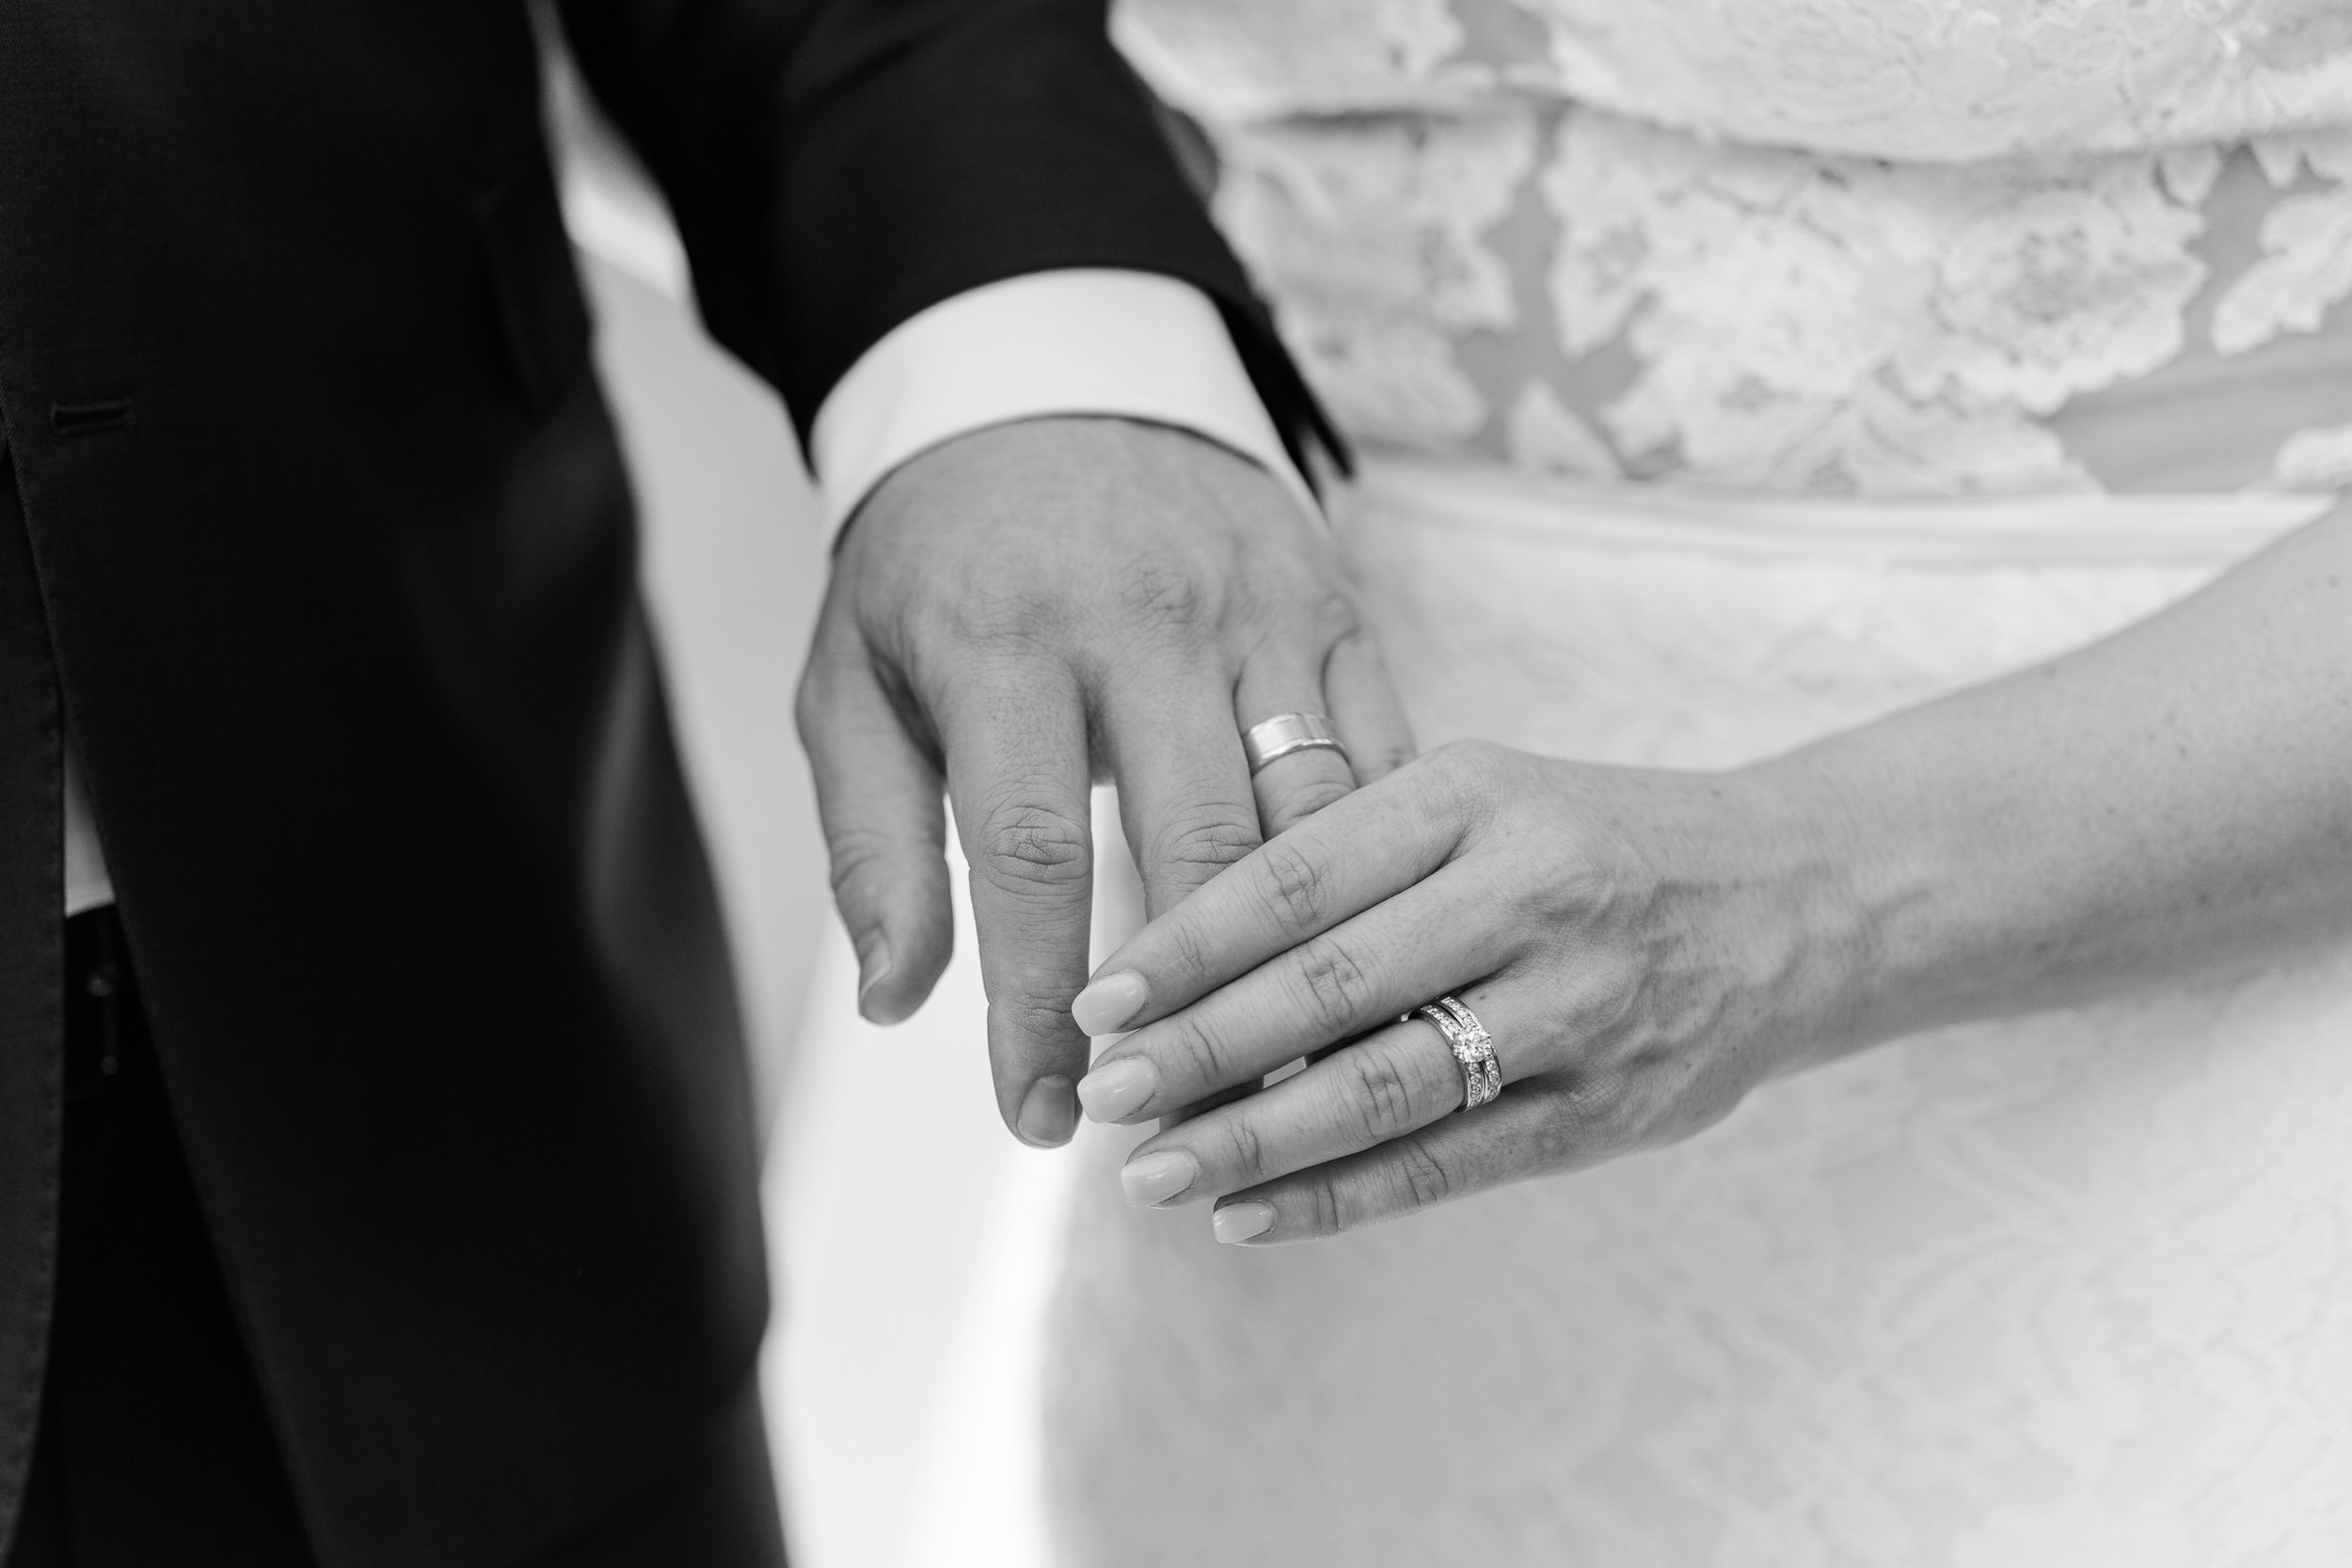 Justin_And_Jim_Photography_Chateau_Dore_Bendigo_Wedding60.JPG